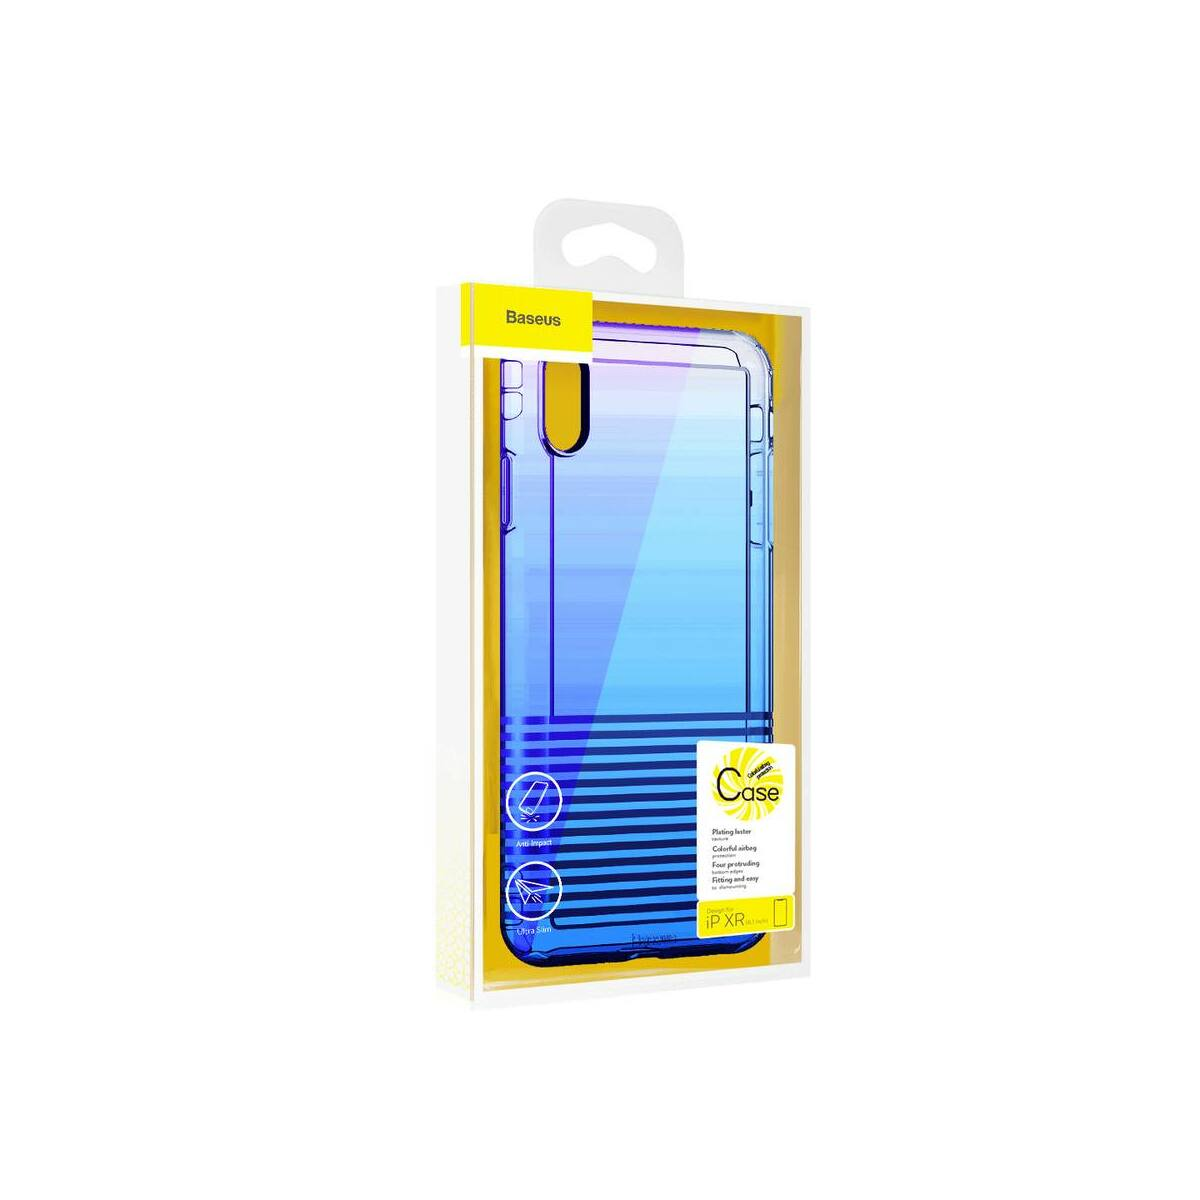 Baseus iPhone XR tok, Colorful Airbag védelem, kék (WIAPIPH61-XC03)